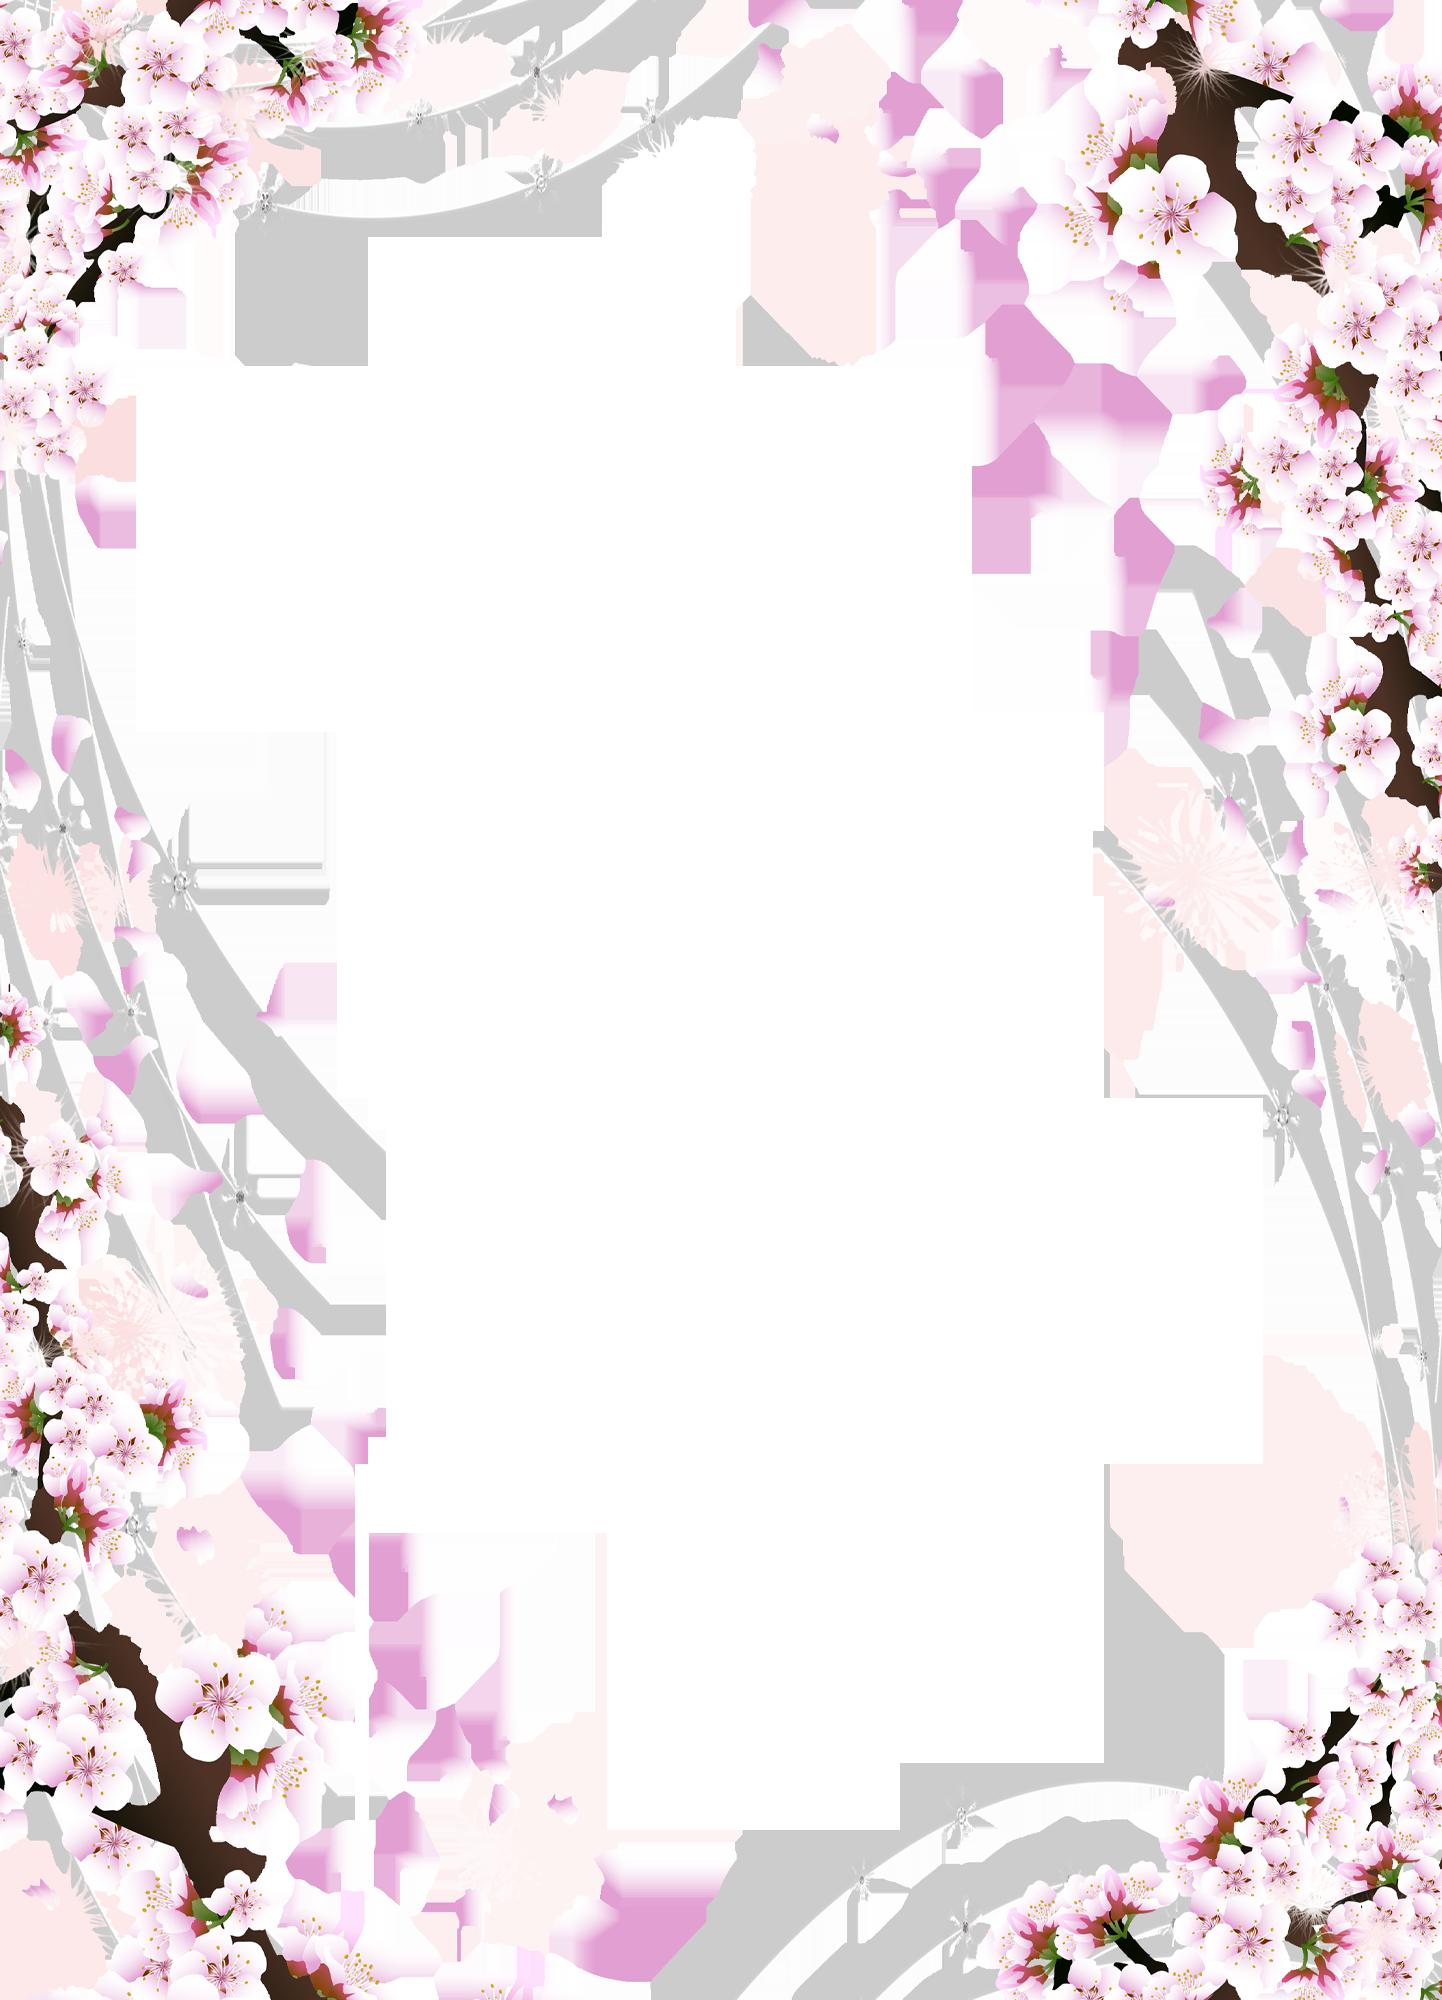 Cherry Blossom Tree Png Google Search Flower Frame Cherry Blossom Background Flower Border